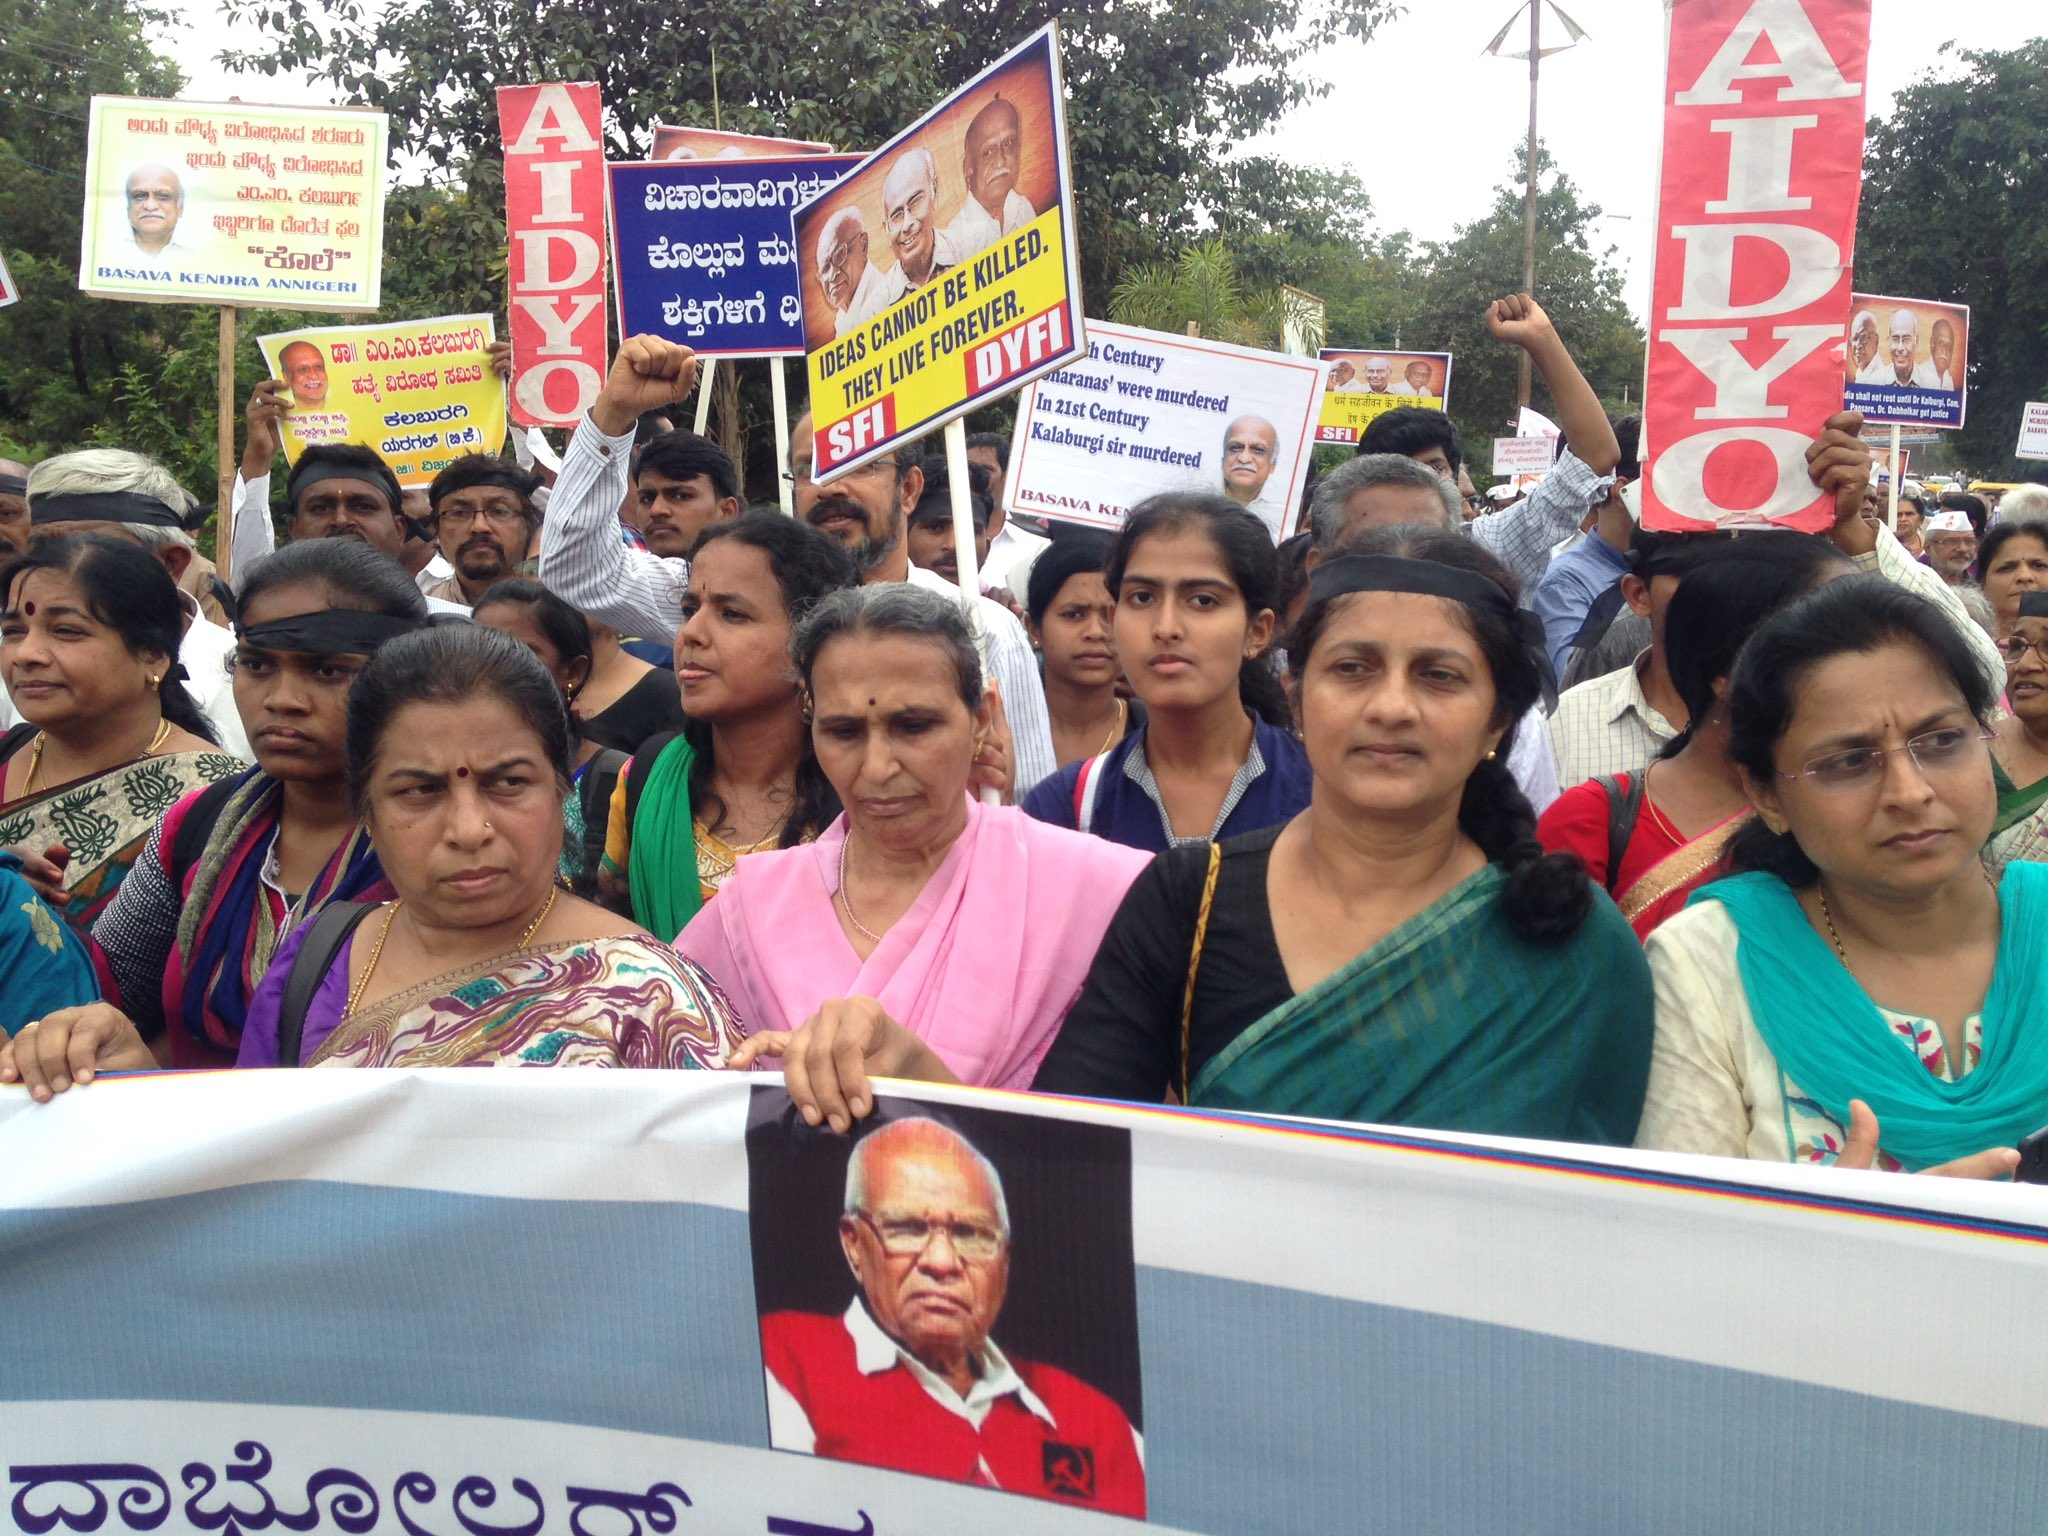 Dabholkar, Pansare Killings: Bombay HC 'Unimpressed' by CBI, CID's Progress